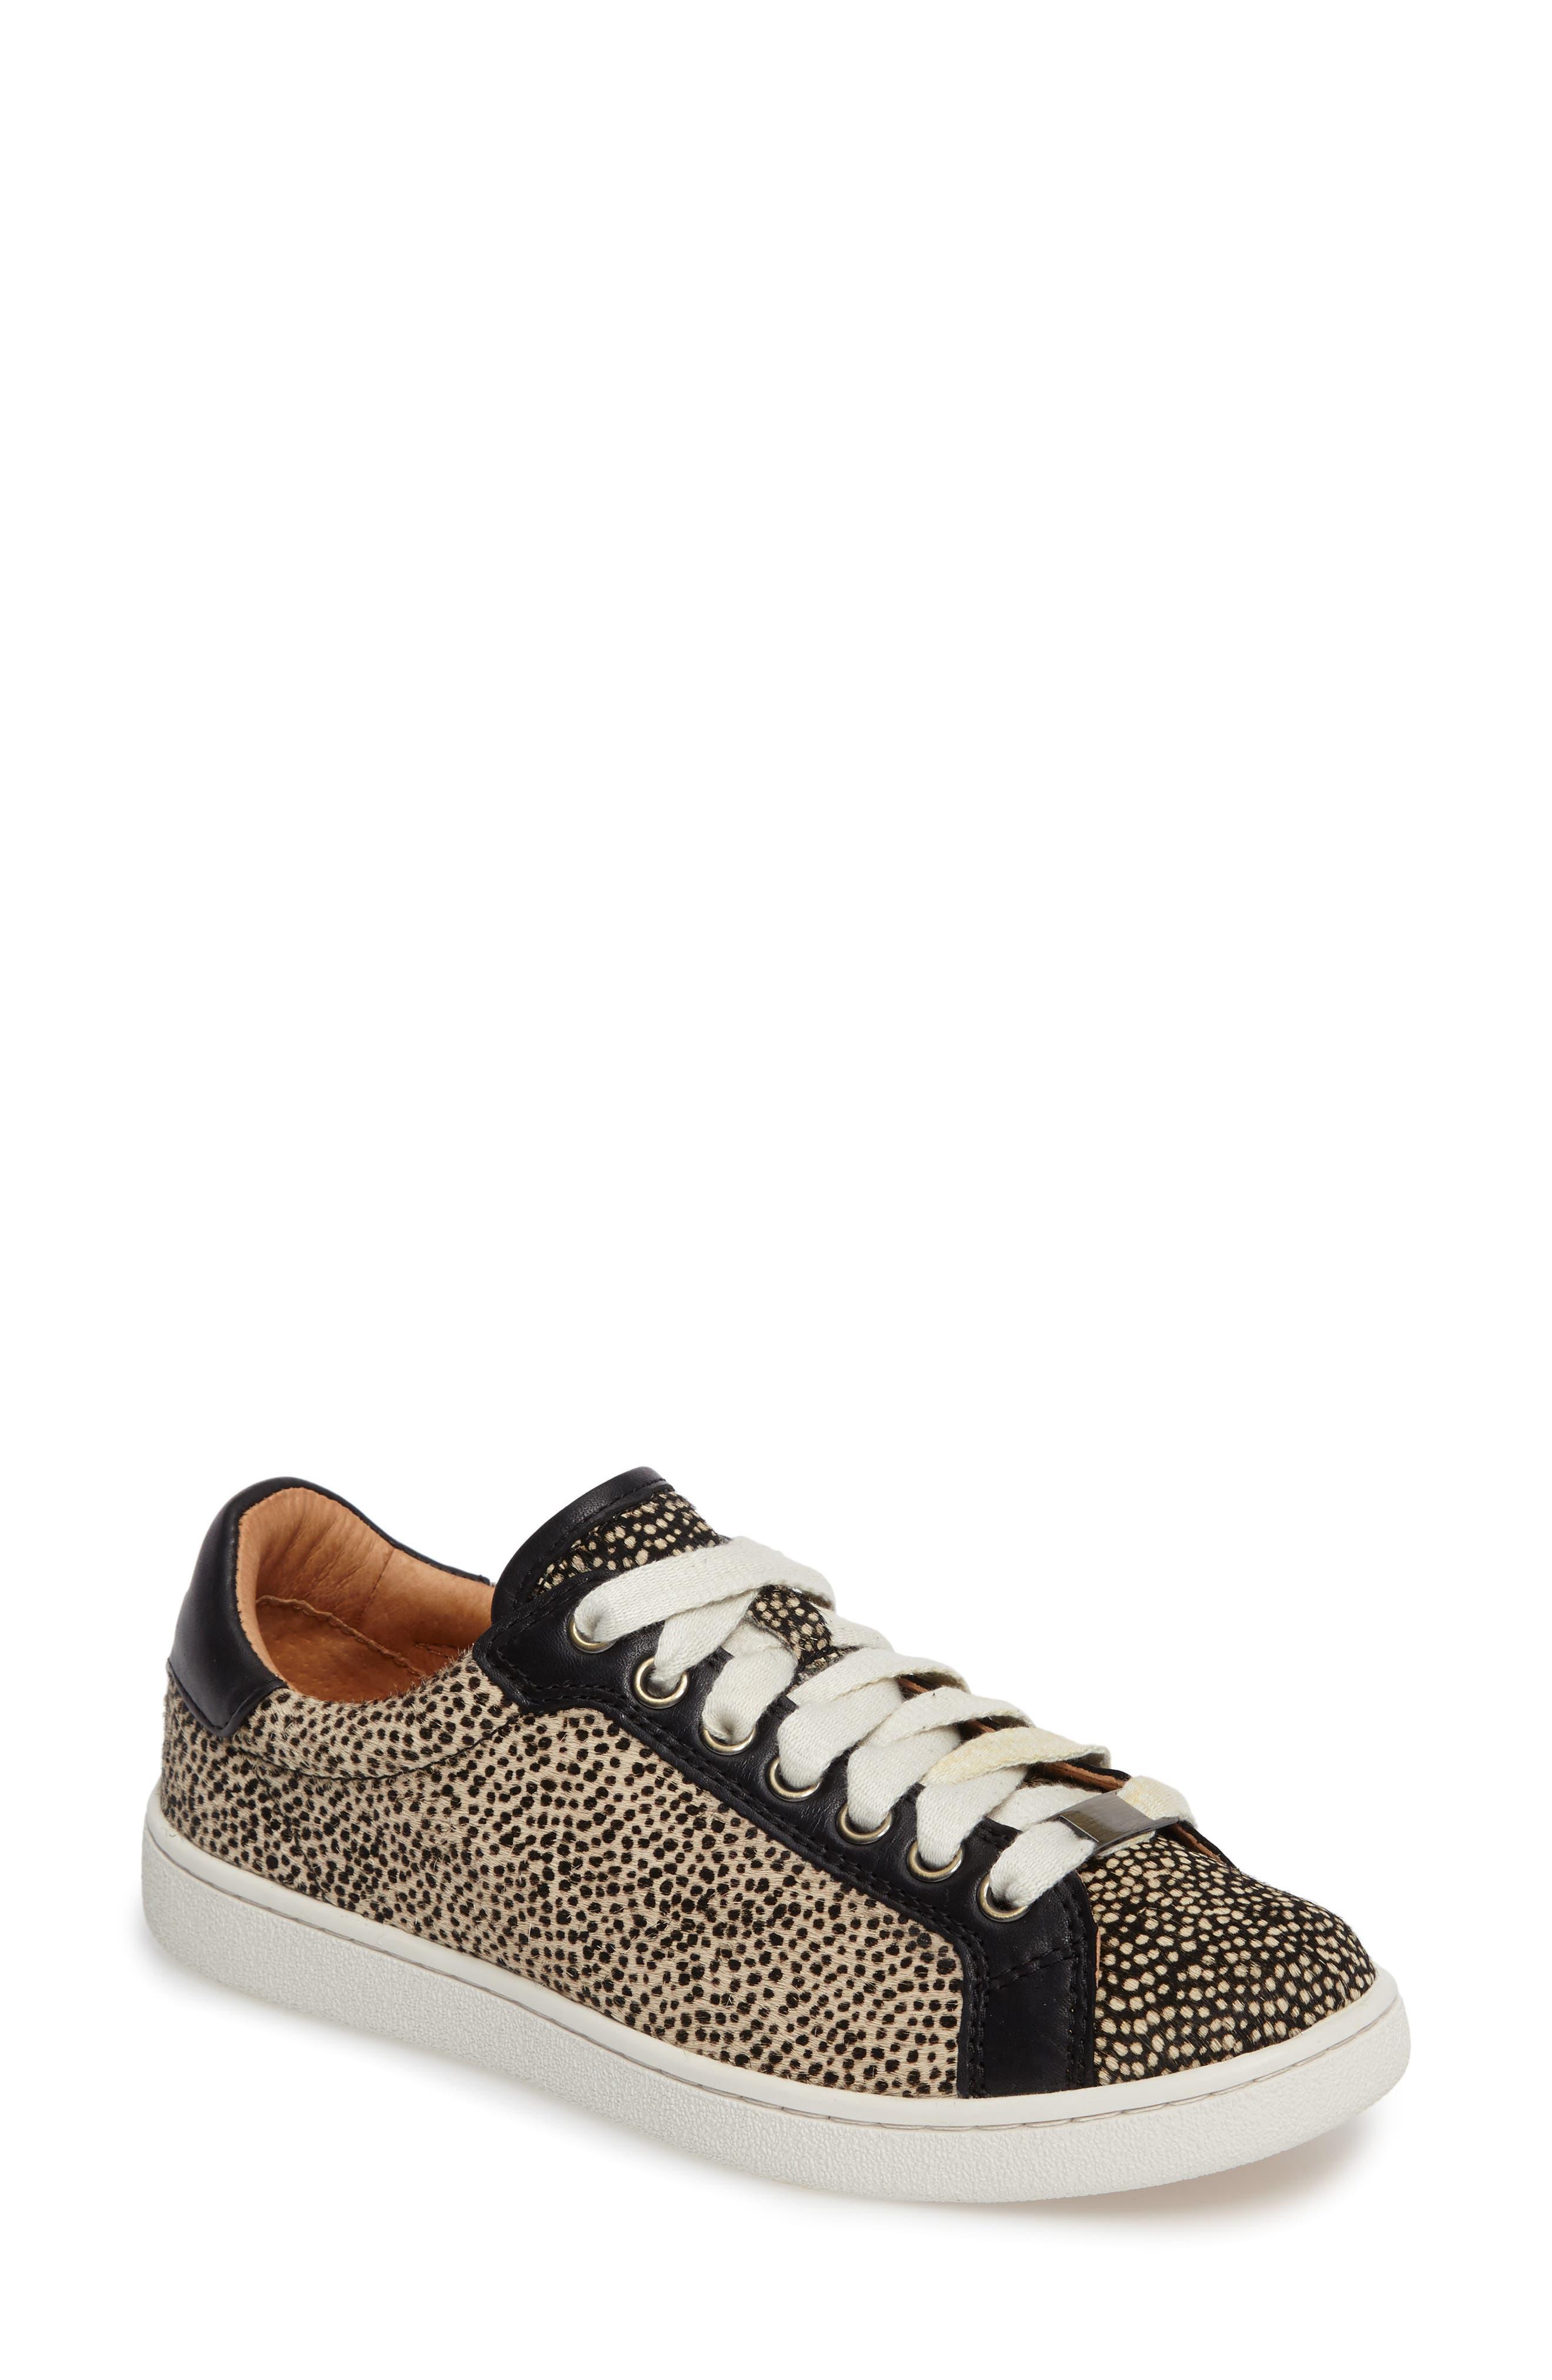 Alternate Image 1 Selected - UGG® Milo Genuine Calf Hair Sneaker (Women)